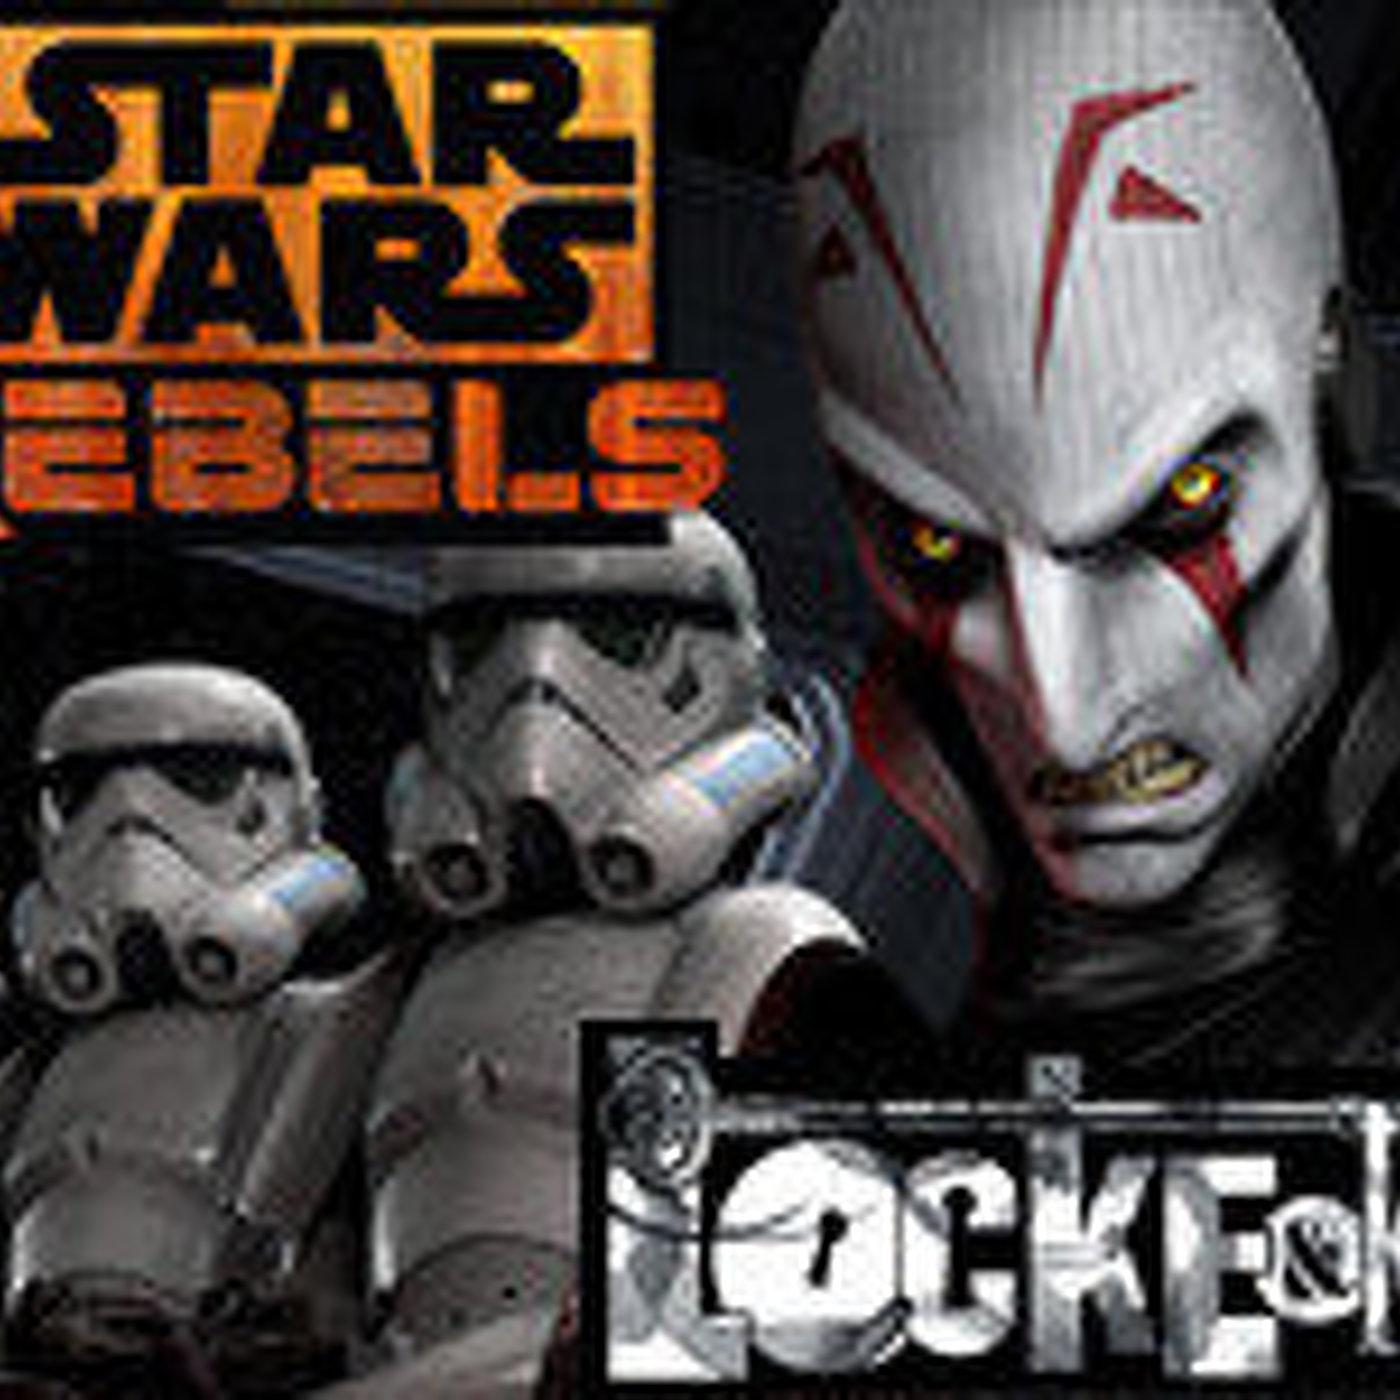 LODE 5x28 Star Wars REBELS – Locke & Key – Loders: Raul Martin